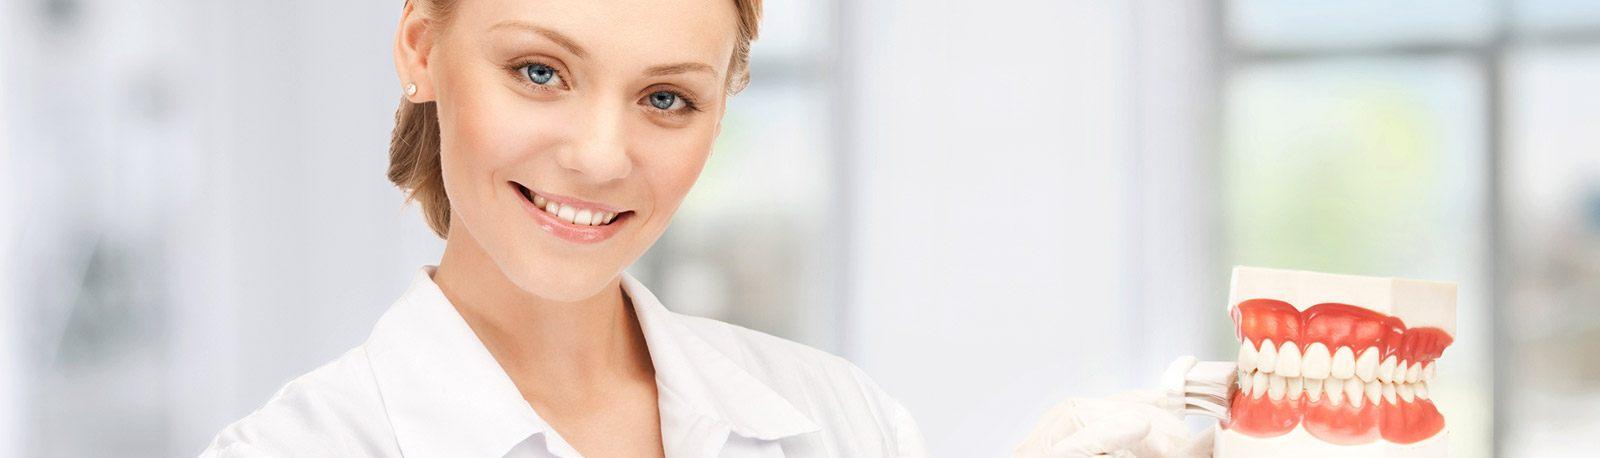 Periodontal Maintenance Cleanings, FL